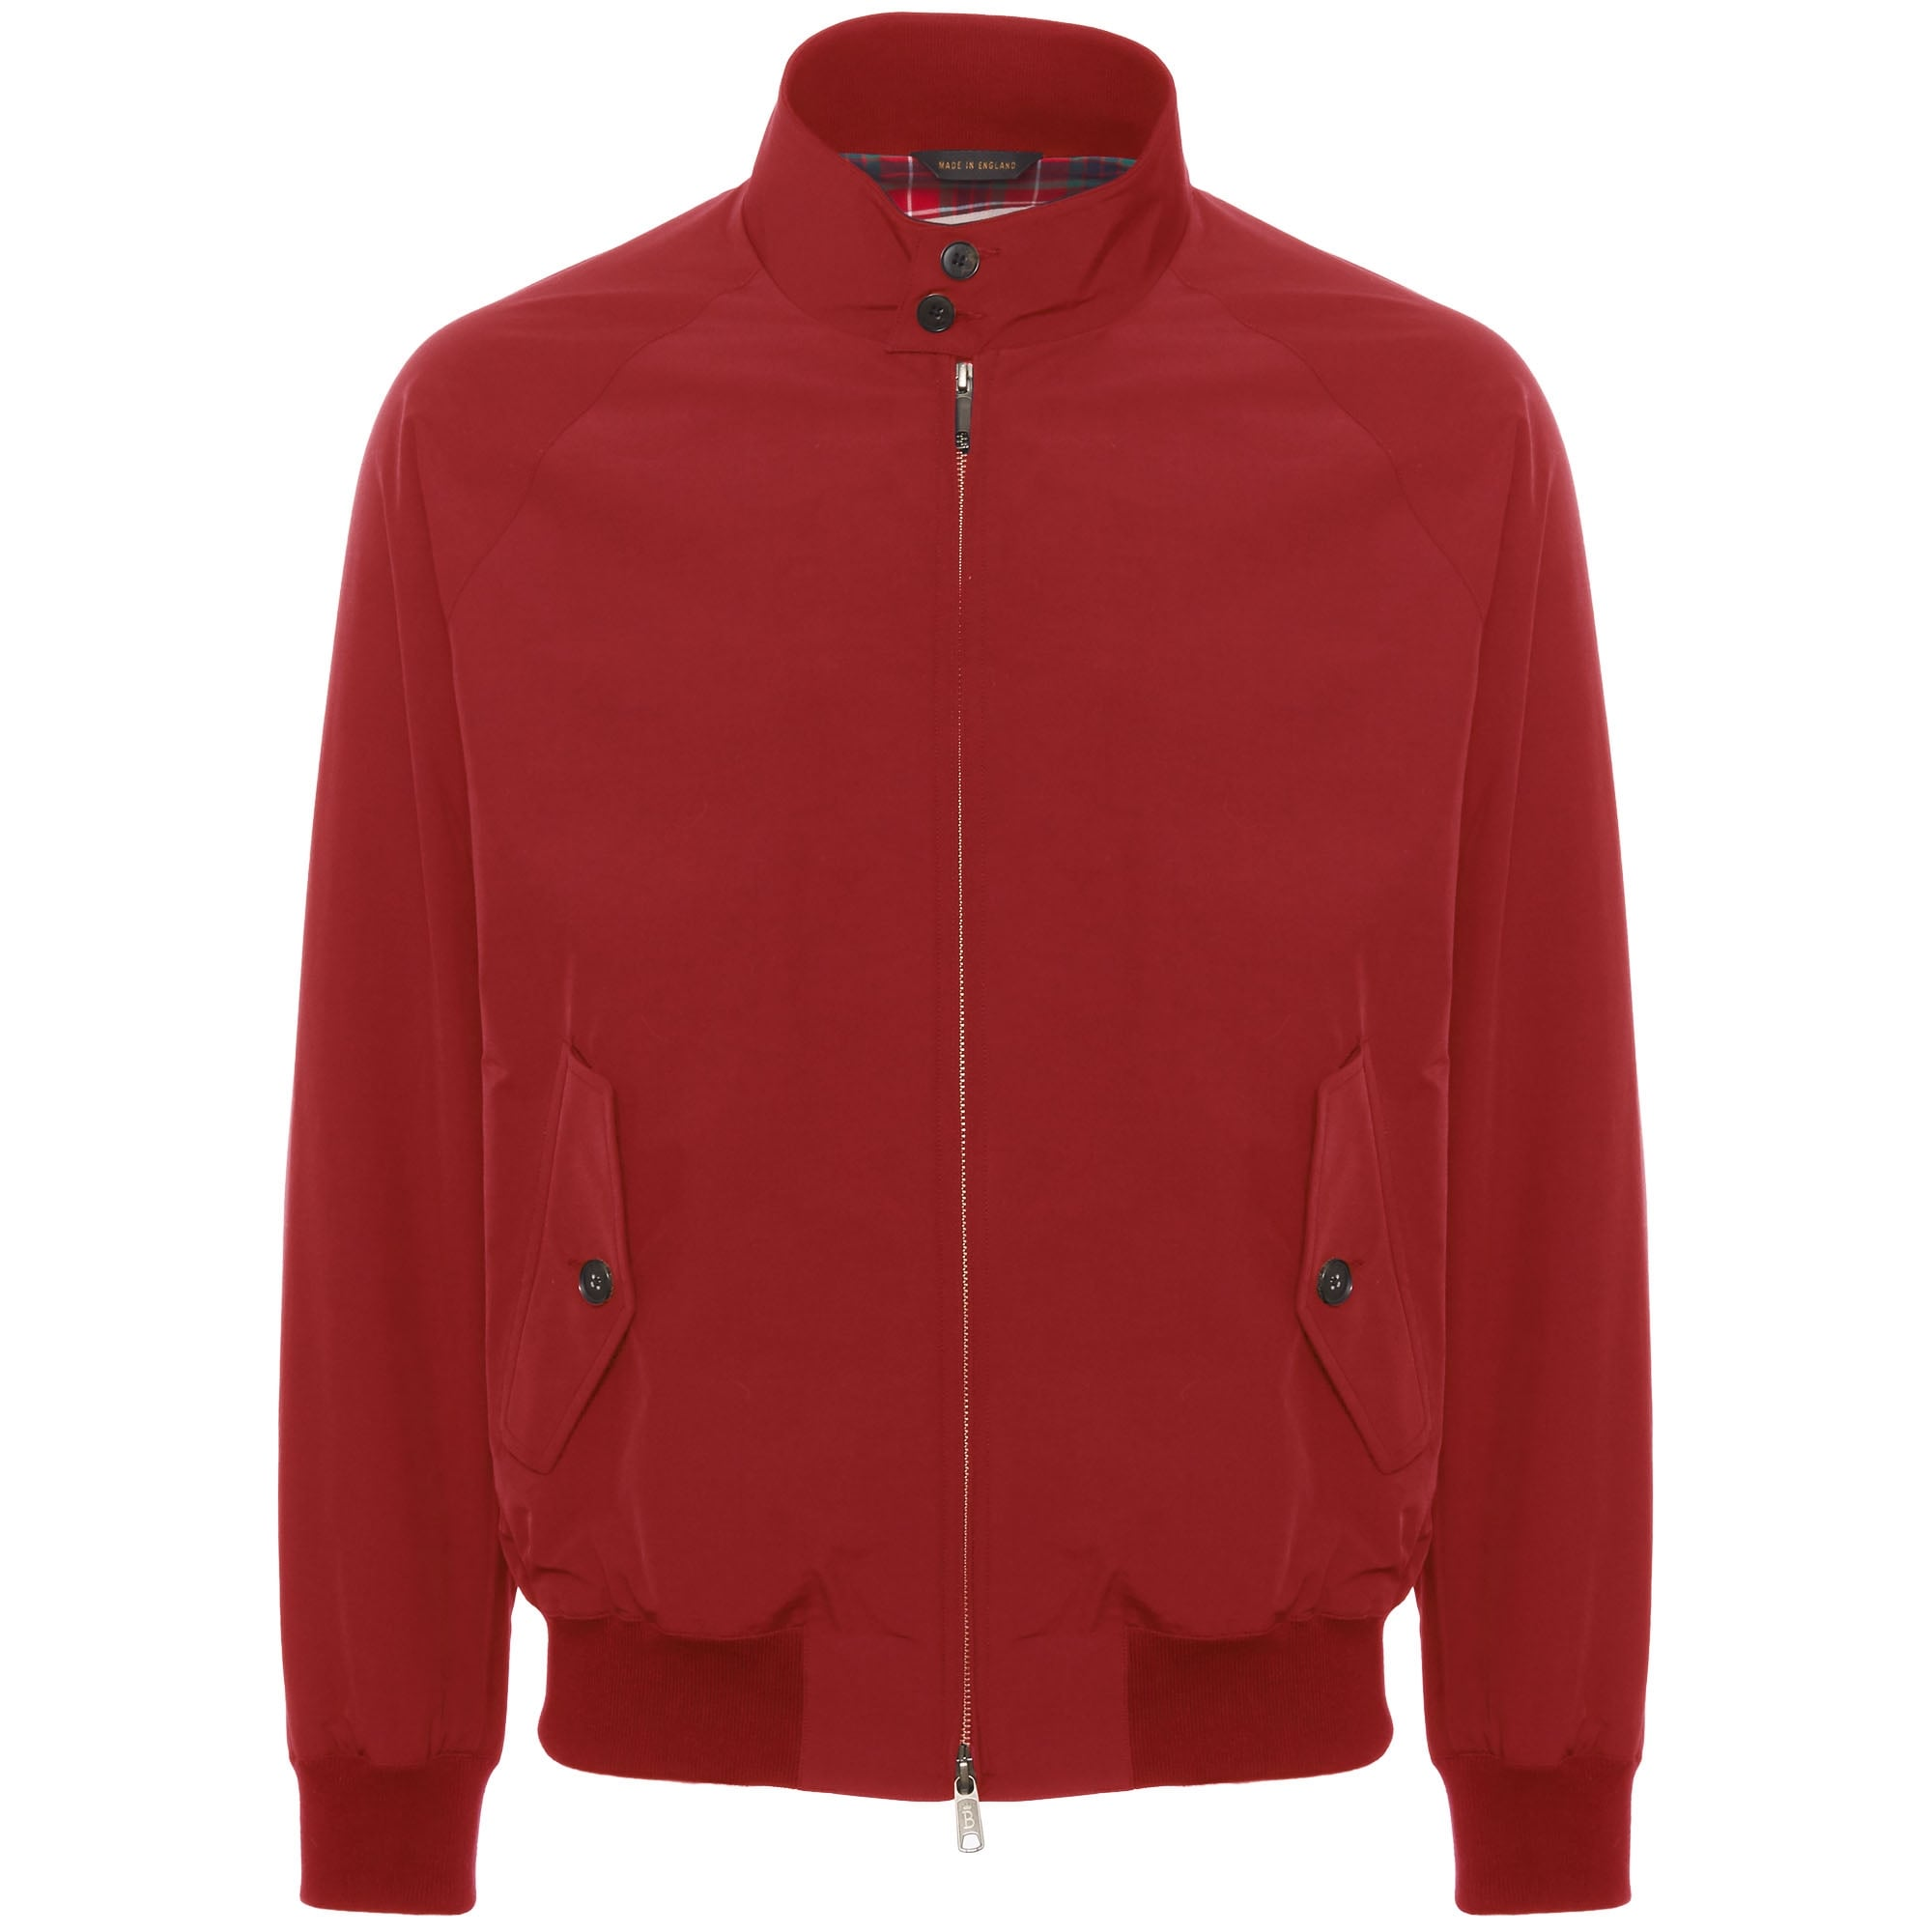 66500e0369574 Baracuta G9 Modern Classic Harrington Jacket Dark Red